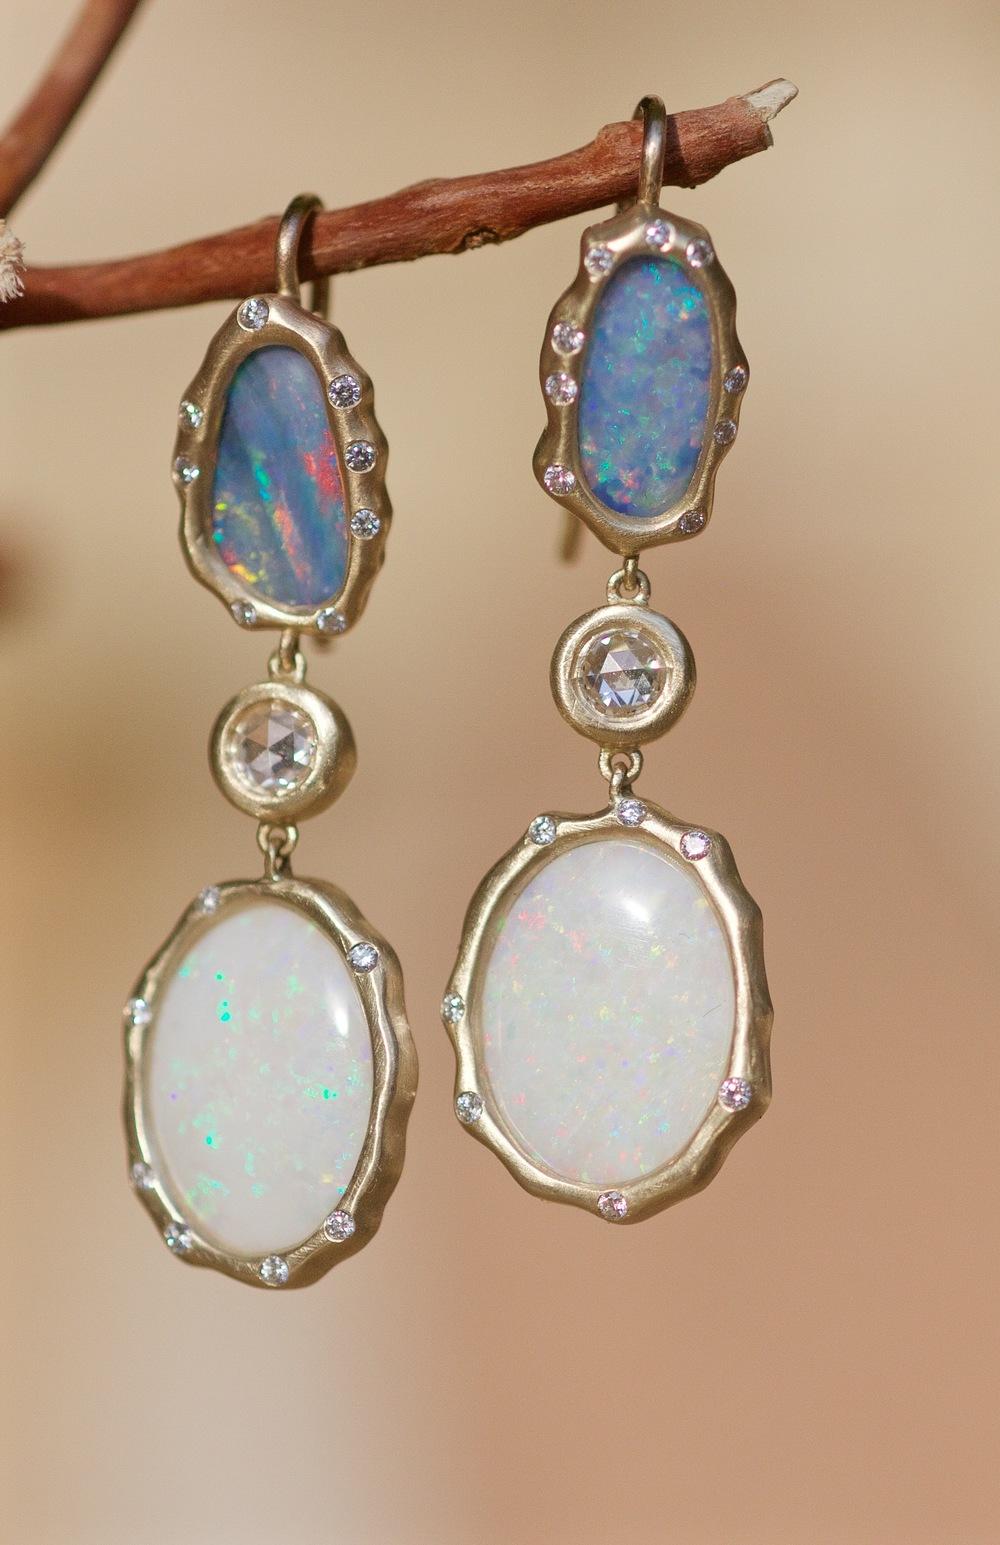 Lara's Opal's